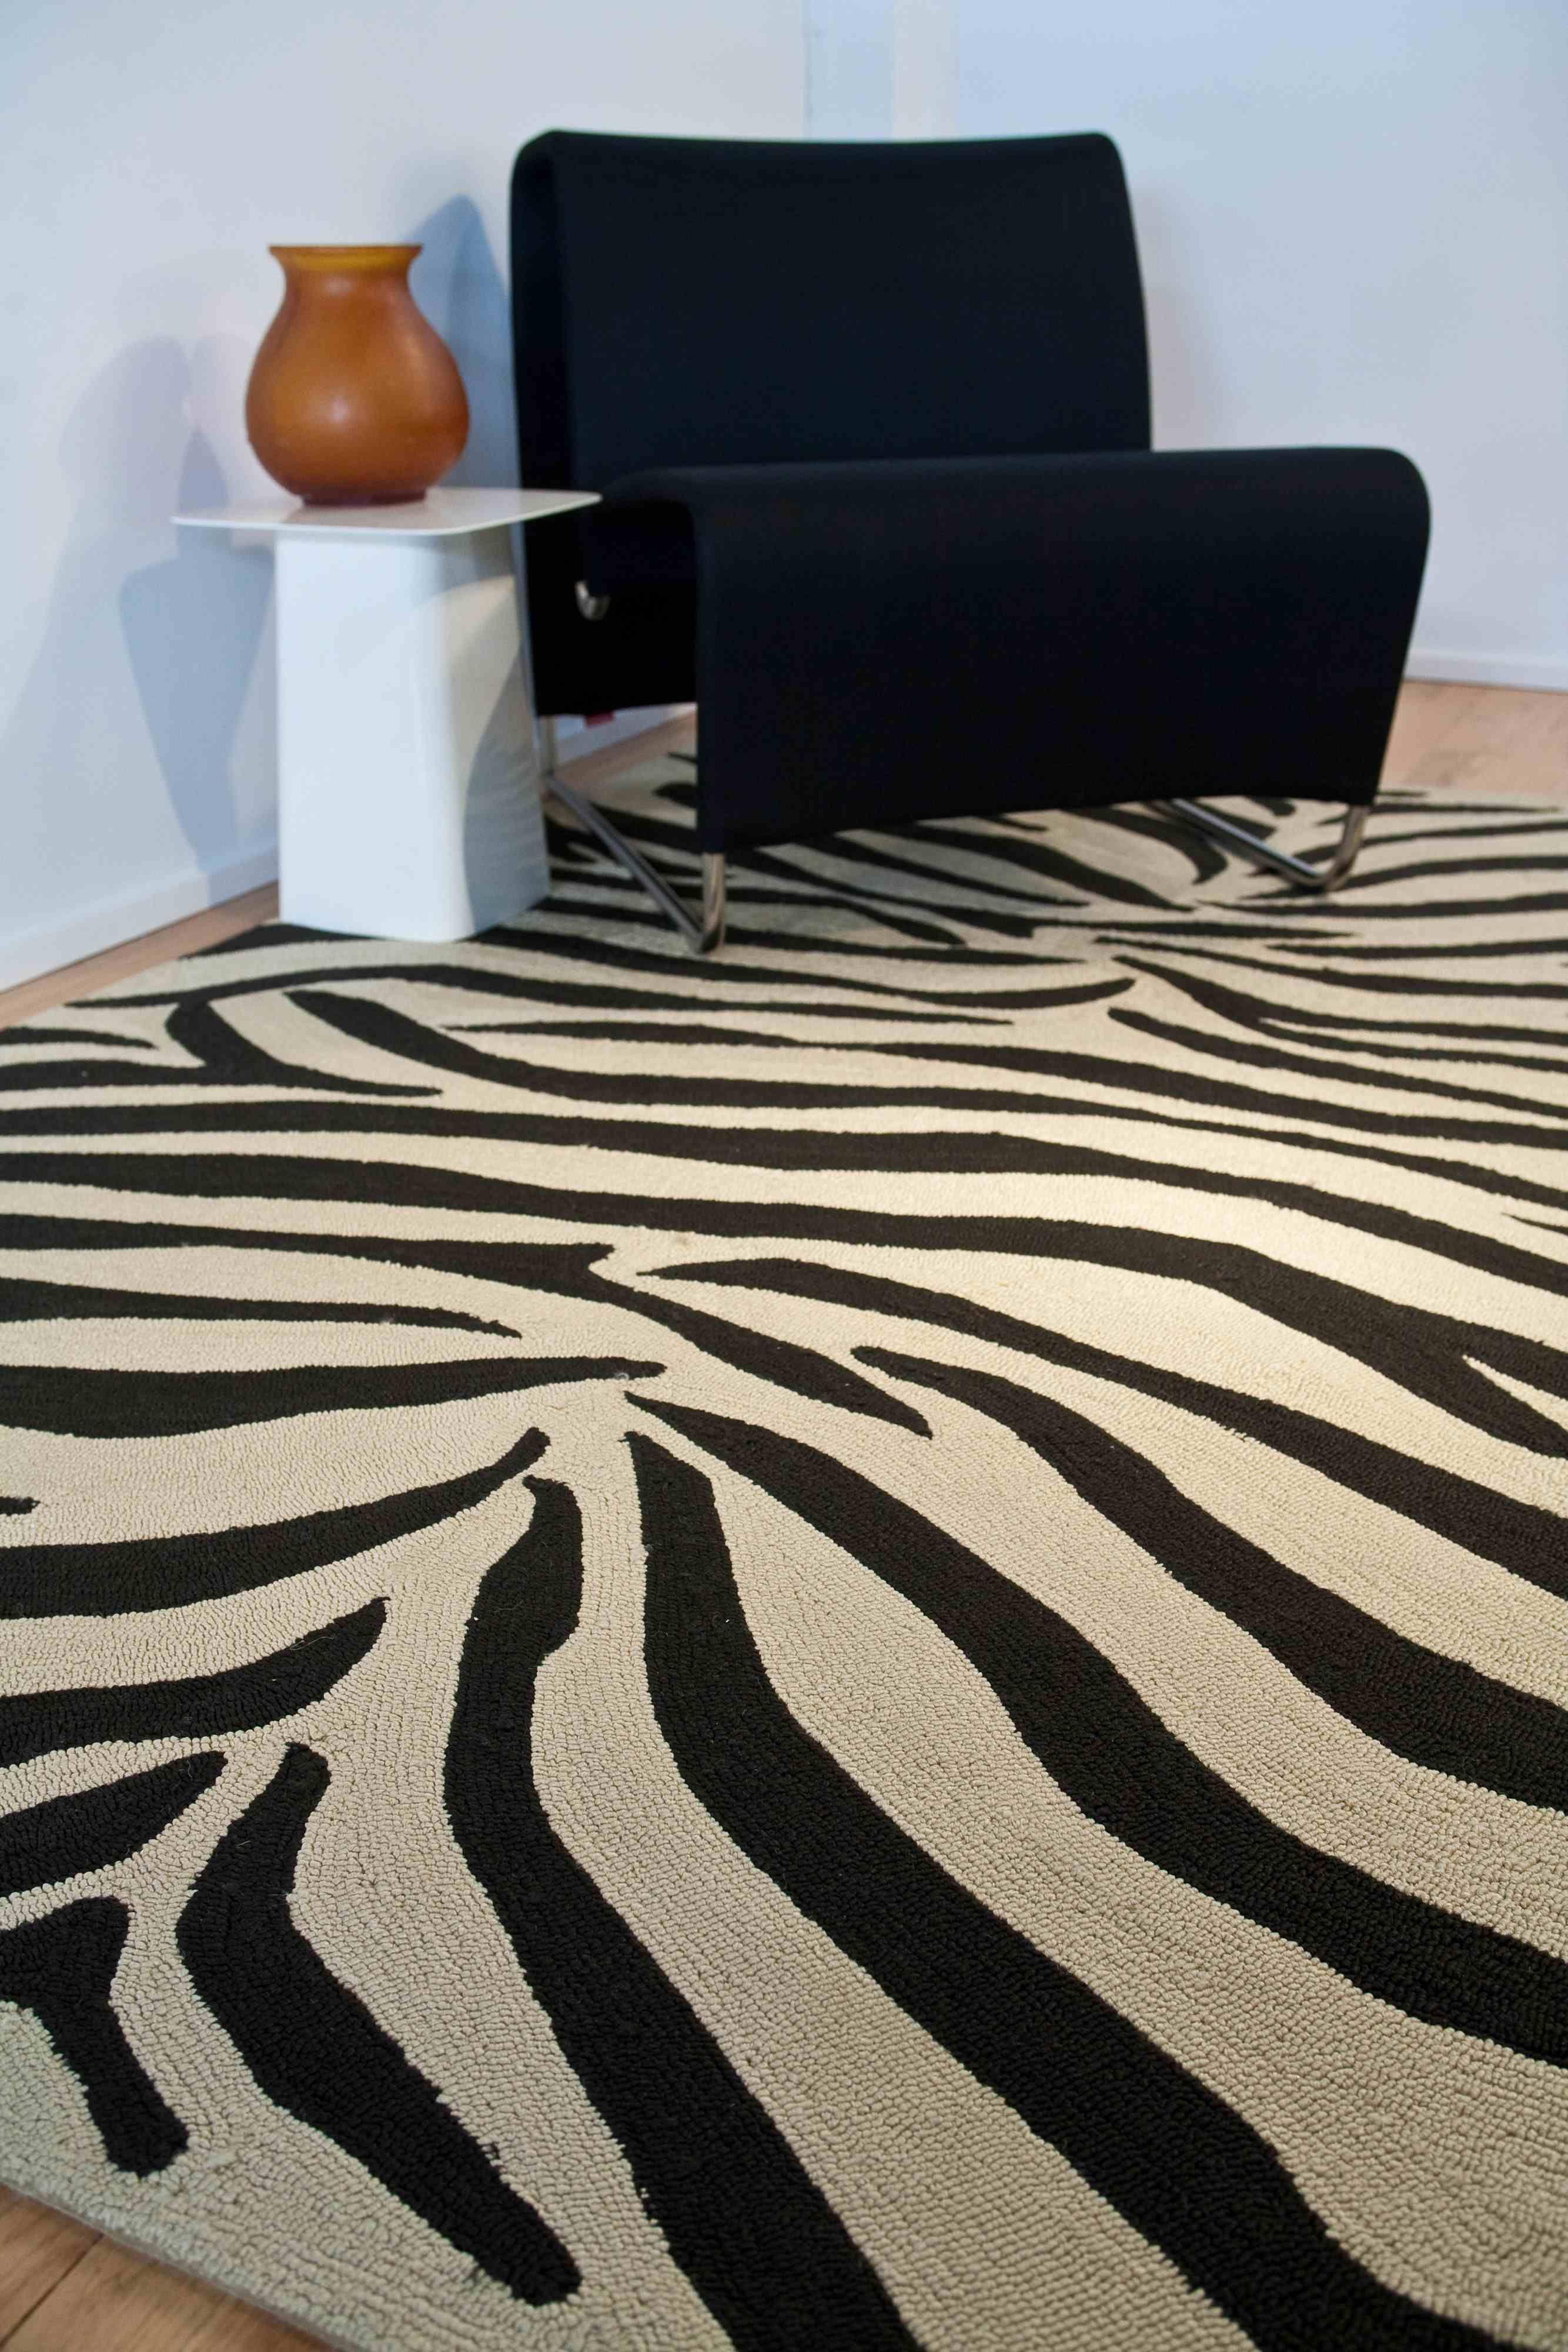 Party lines rug by jaipur is striking